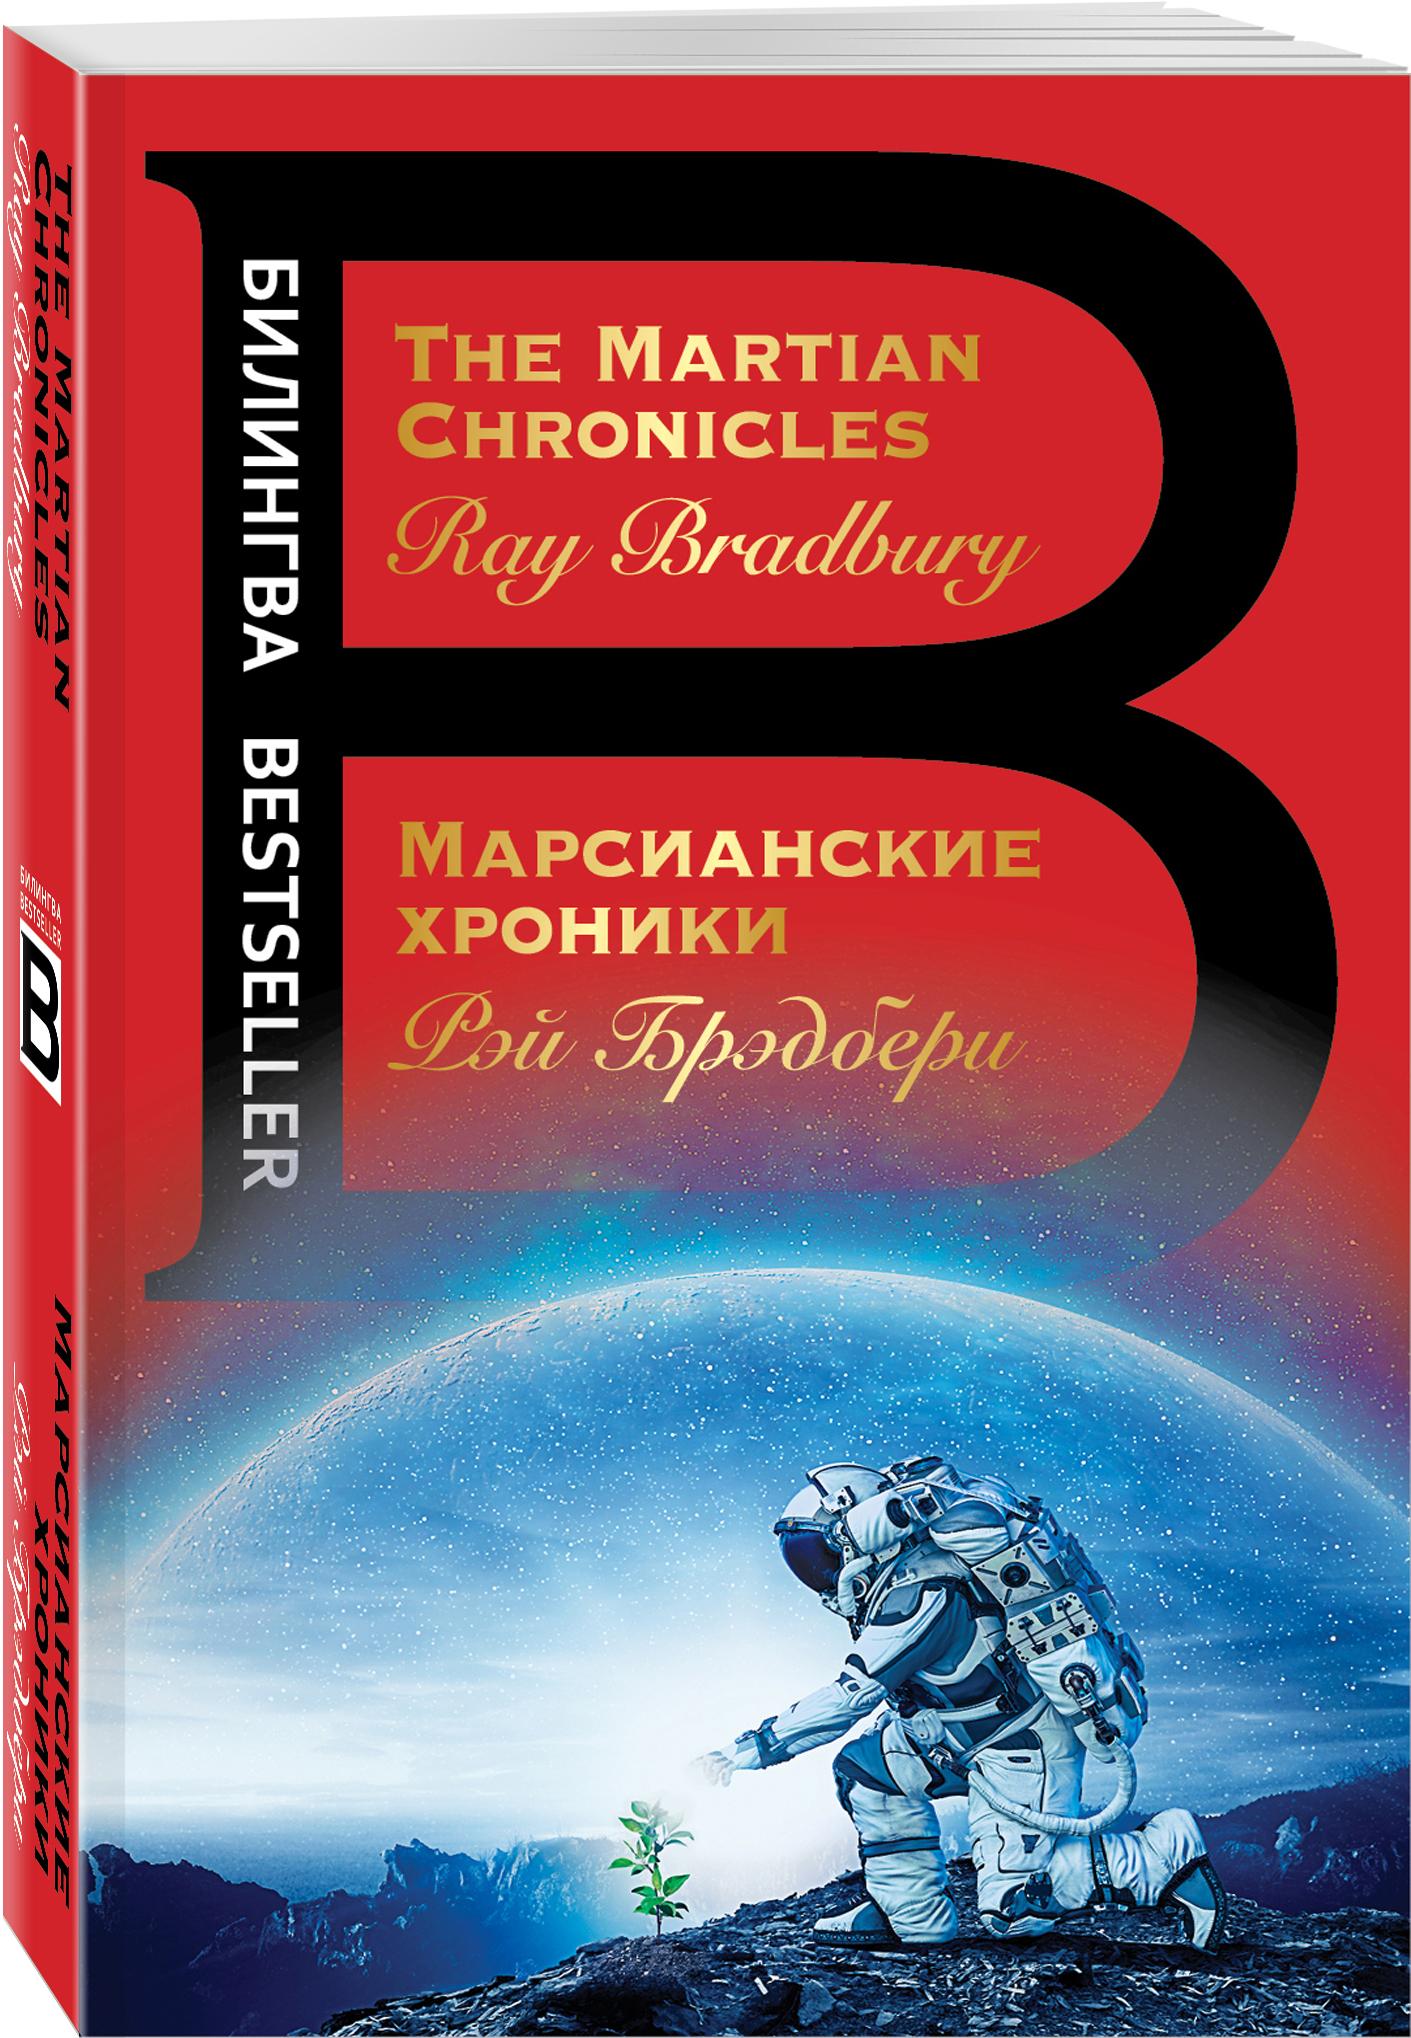 Брэдбери Р. Марсианские хроники. The Martian Chronicles брэдбери р марсианские хроники the martian chronicles книга для чтения на английском языке